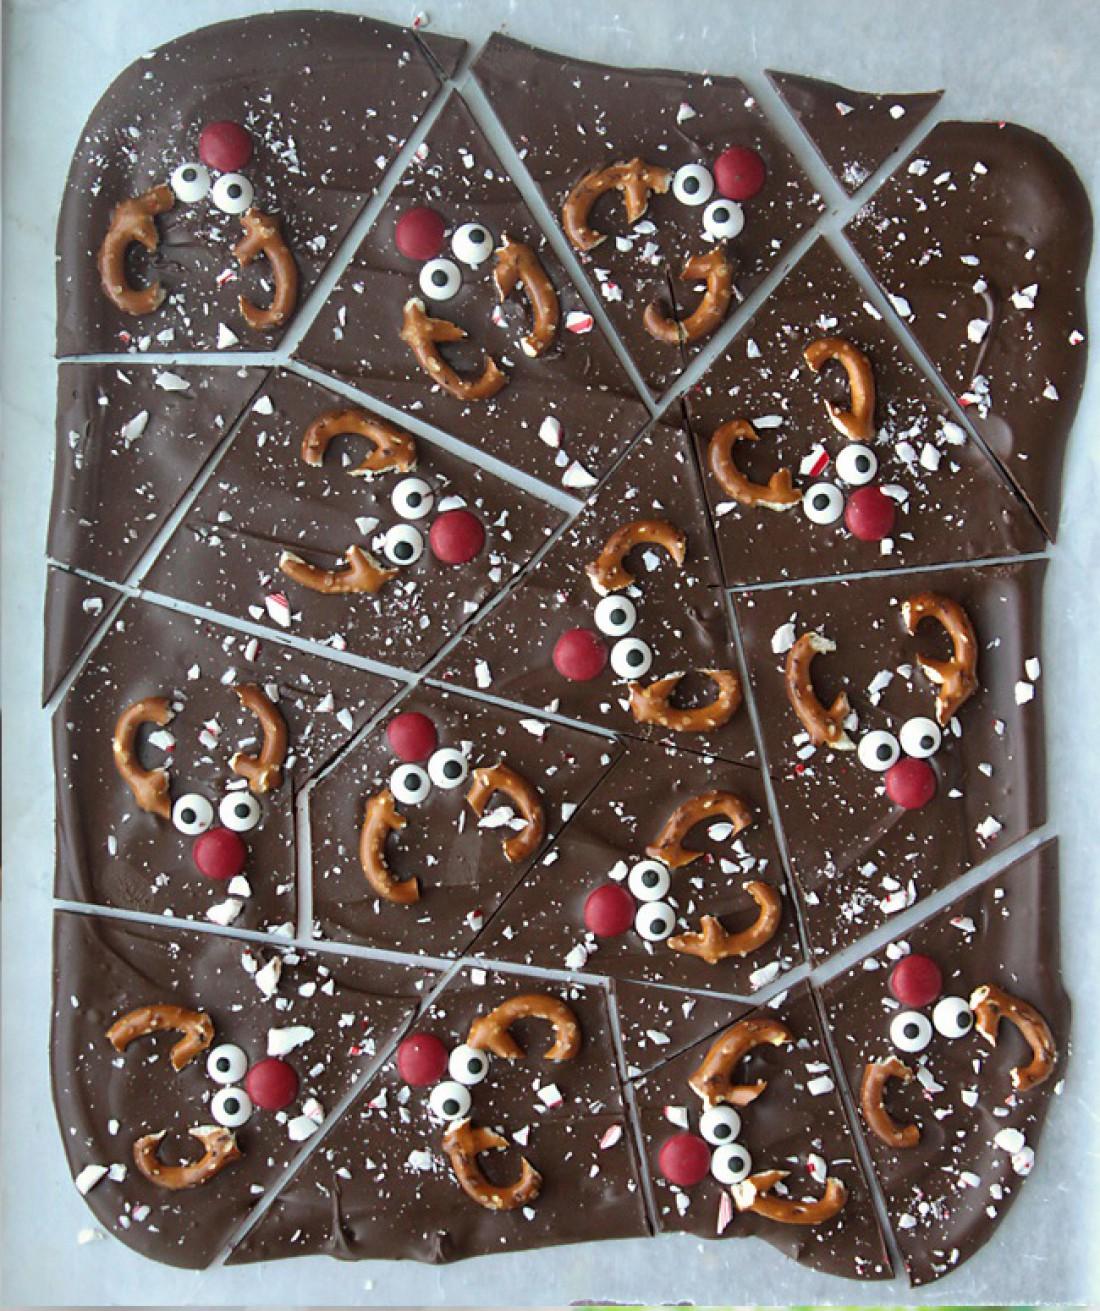 Шоколад конфеты мастер класс видео своими руками #10